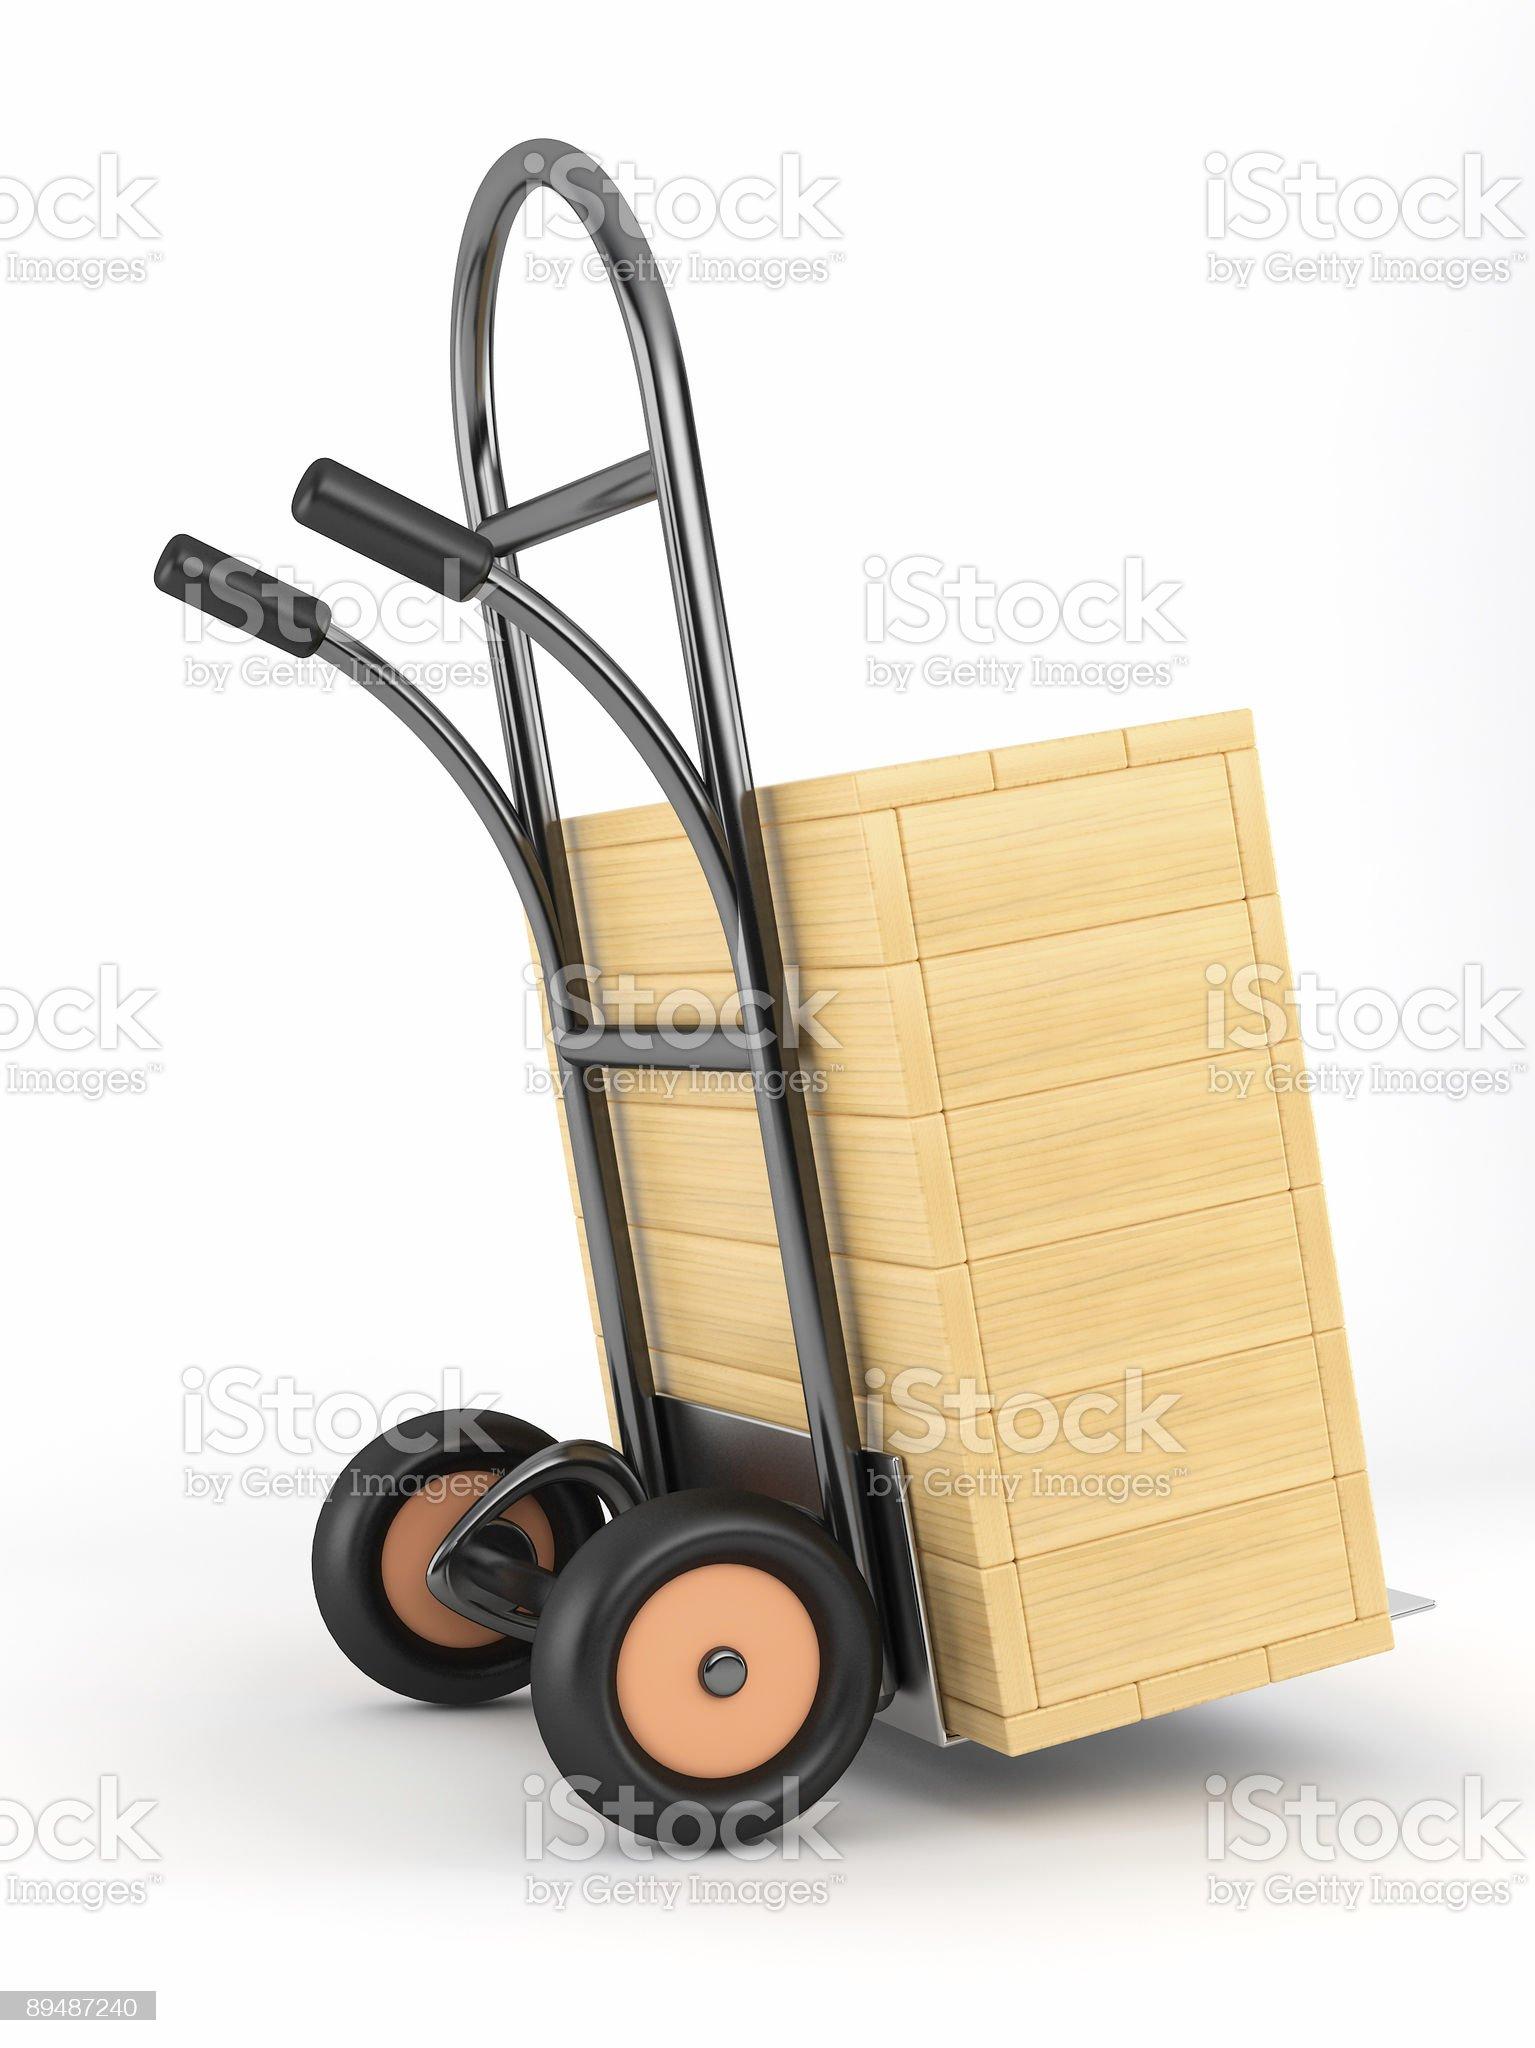 handcart and box royalty-free stock photo